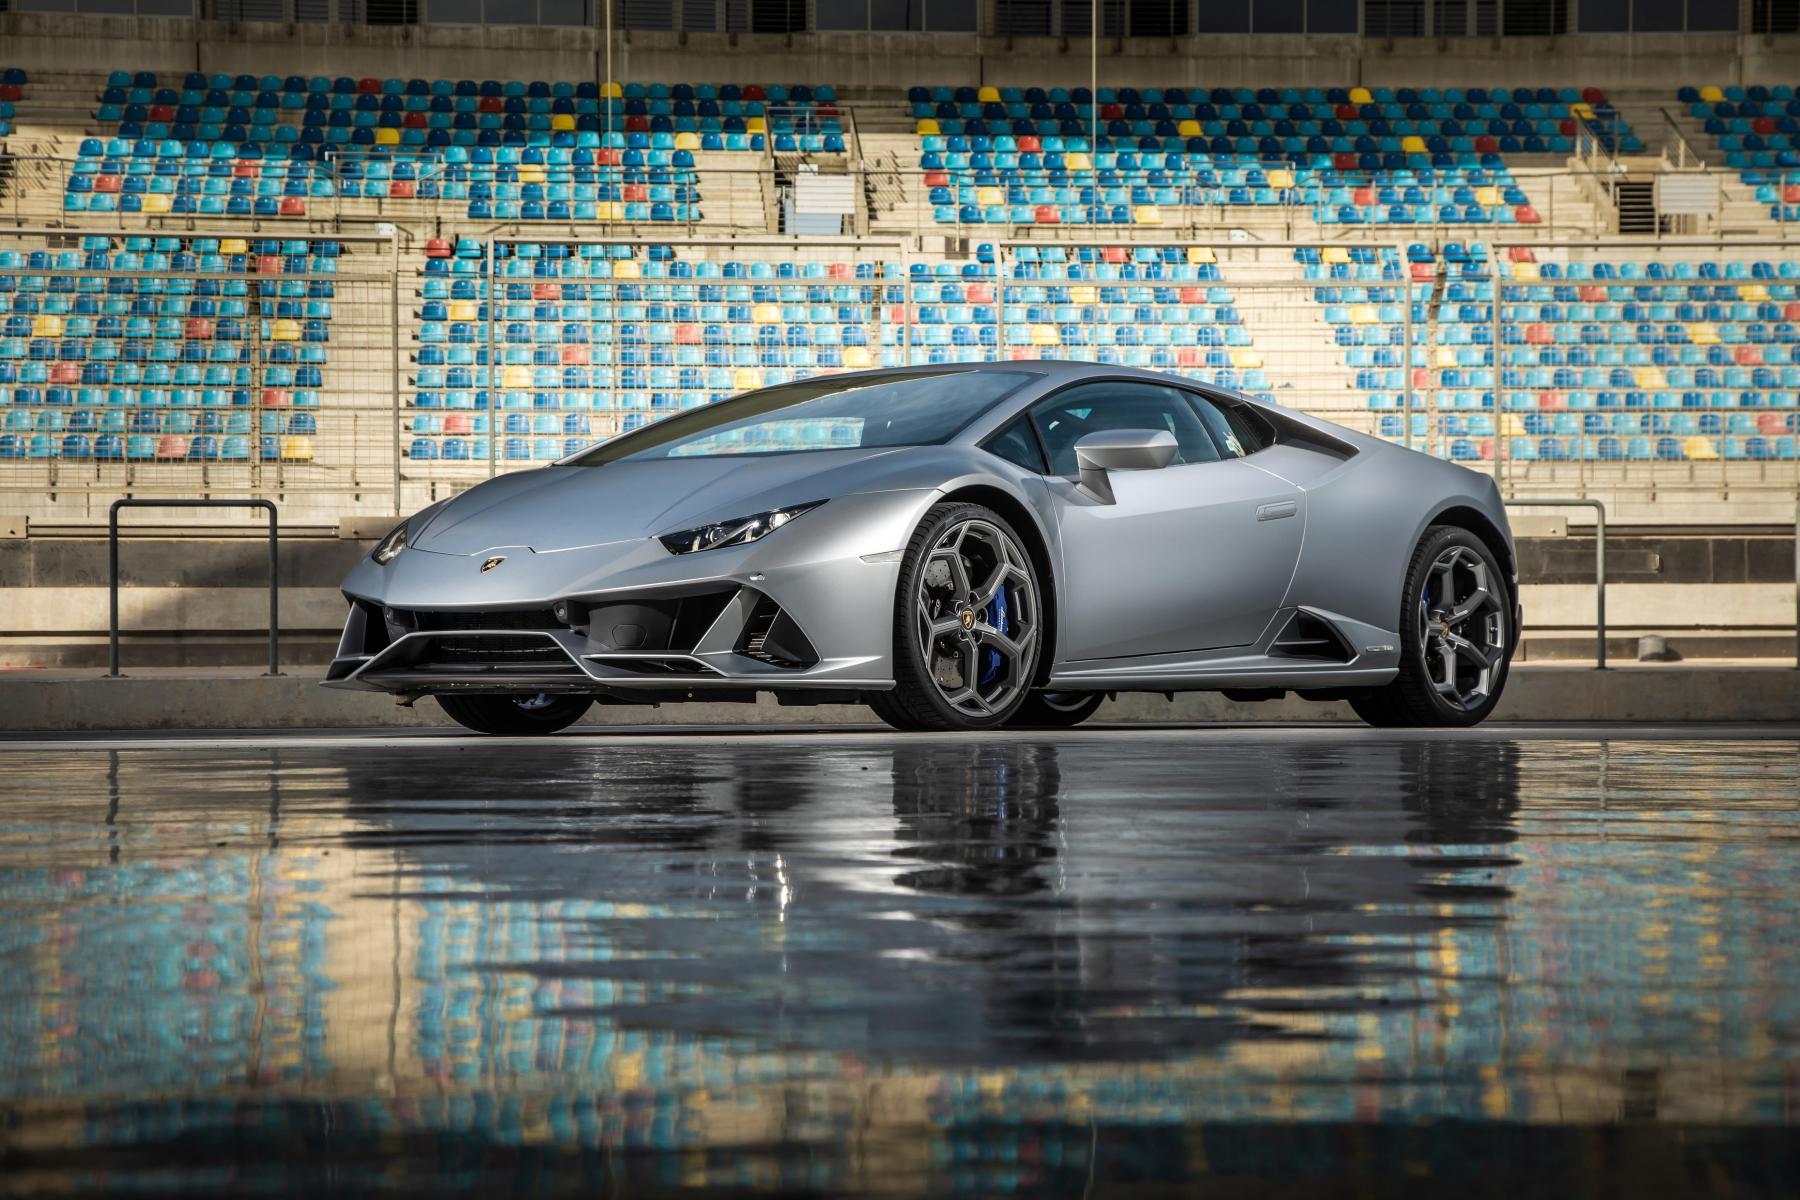 Lamborghini Huracan EVO - Amazon Alexa